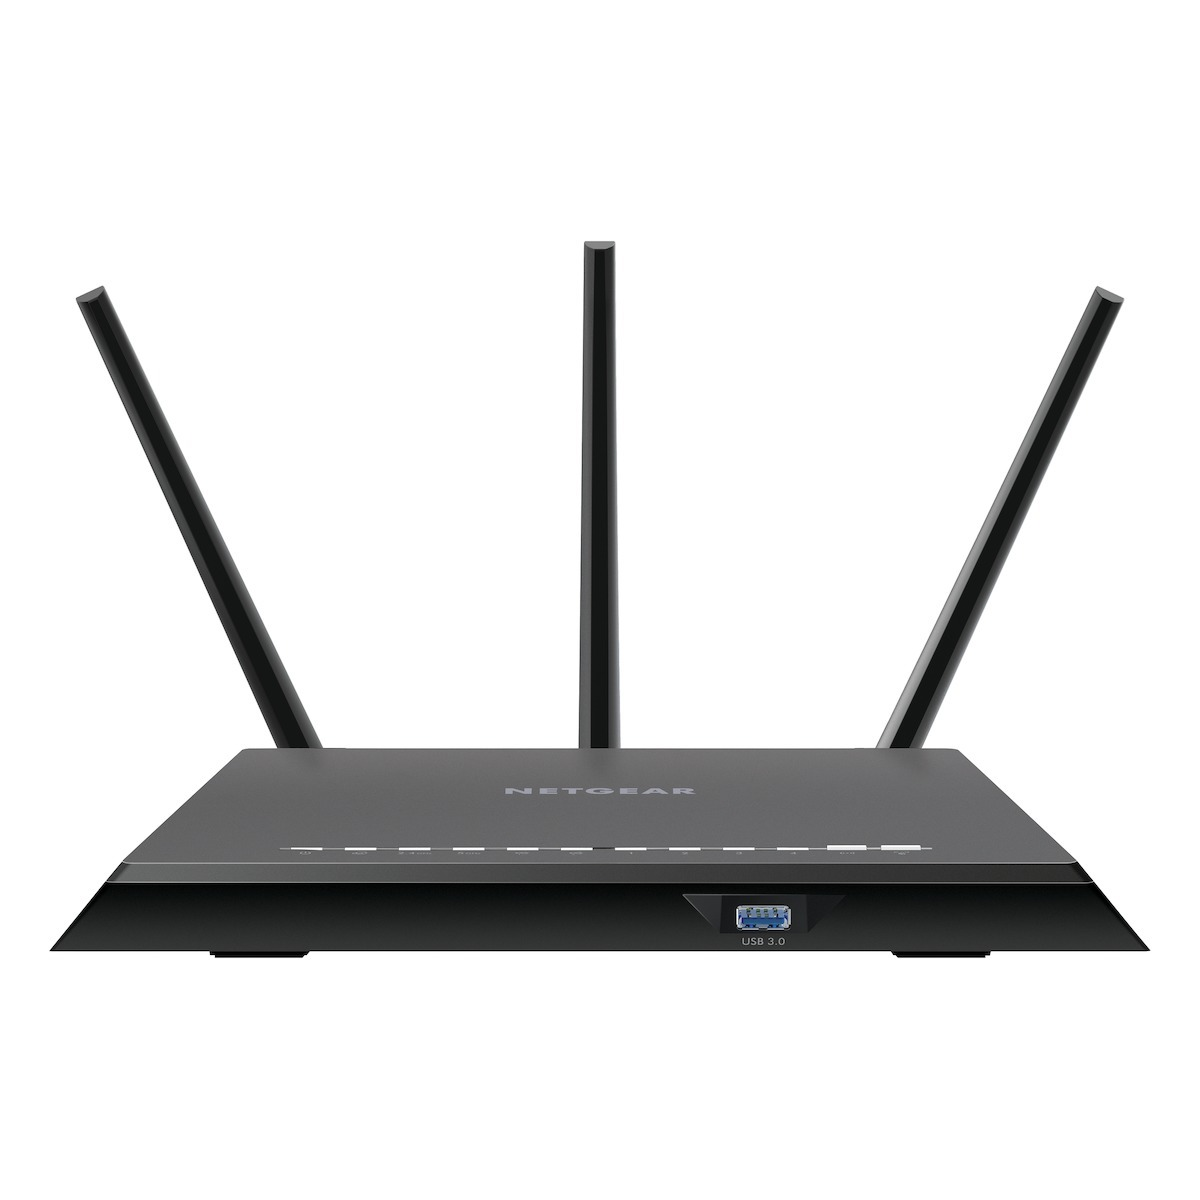 Netgear router R7000 100PES